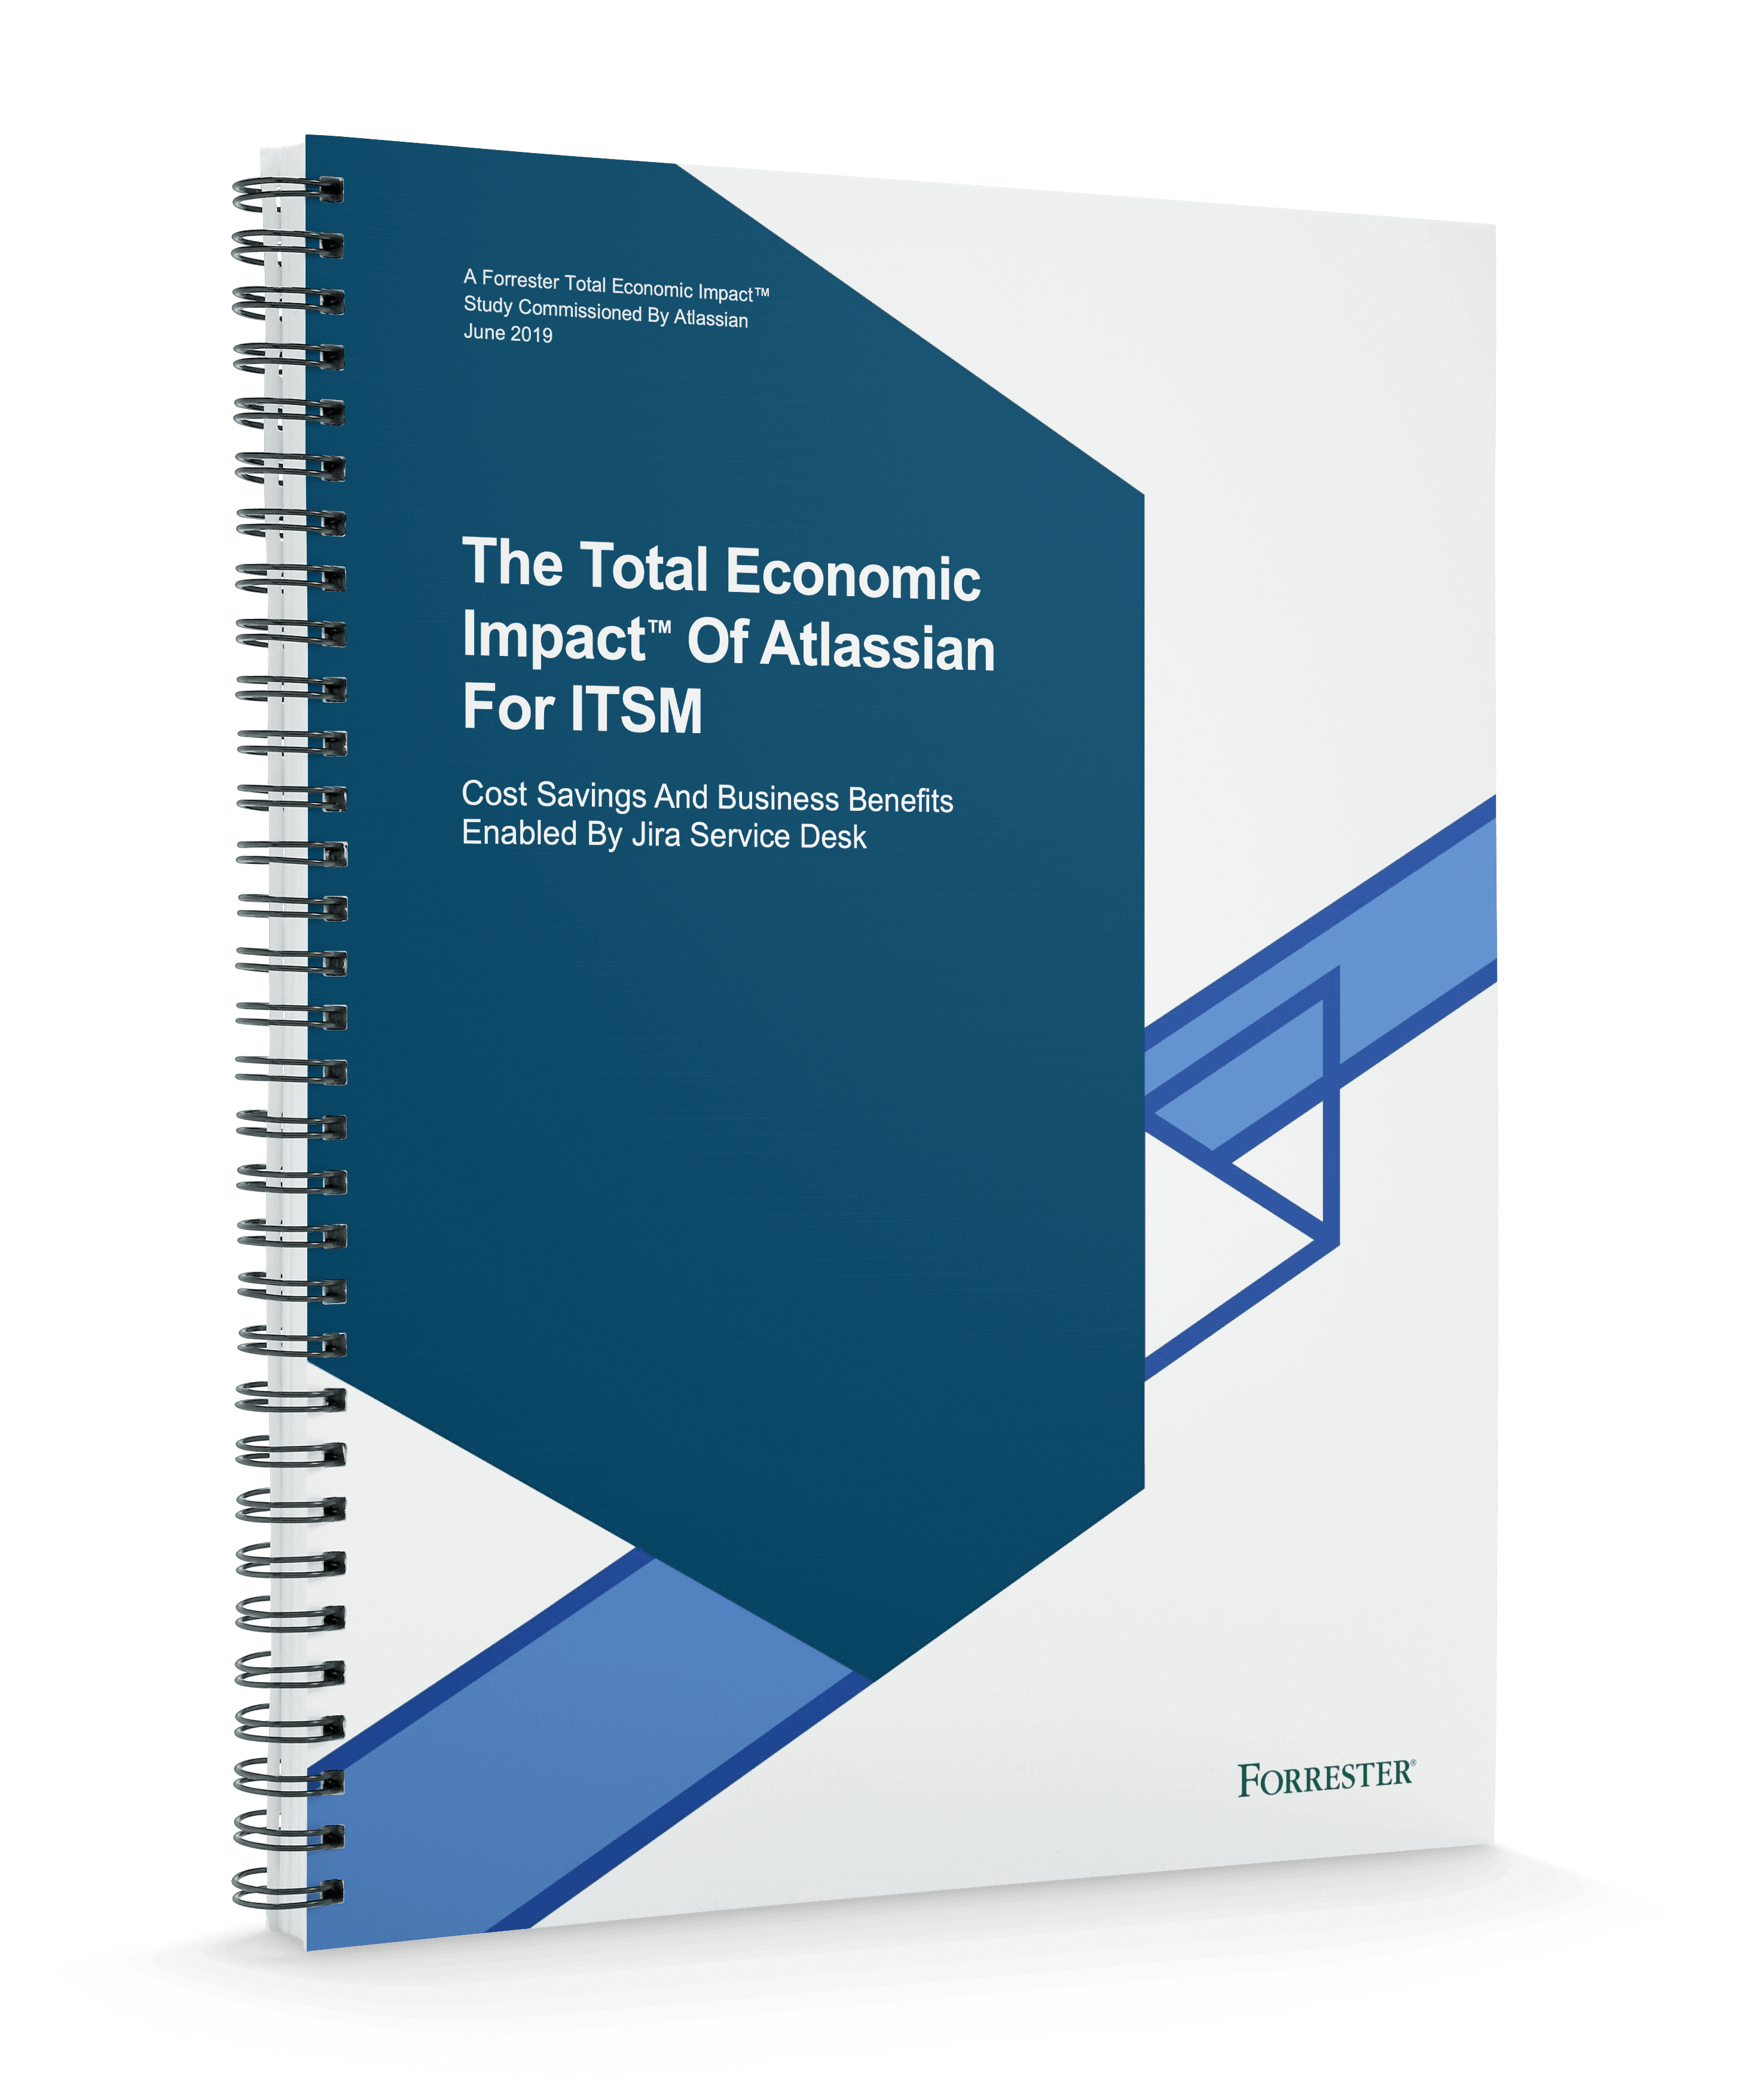 Forresters Total Economic Impact™ von Atlassian für ITSM